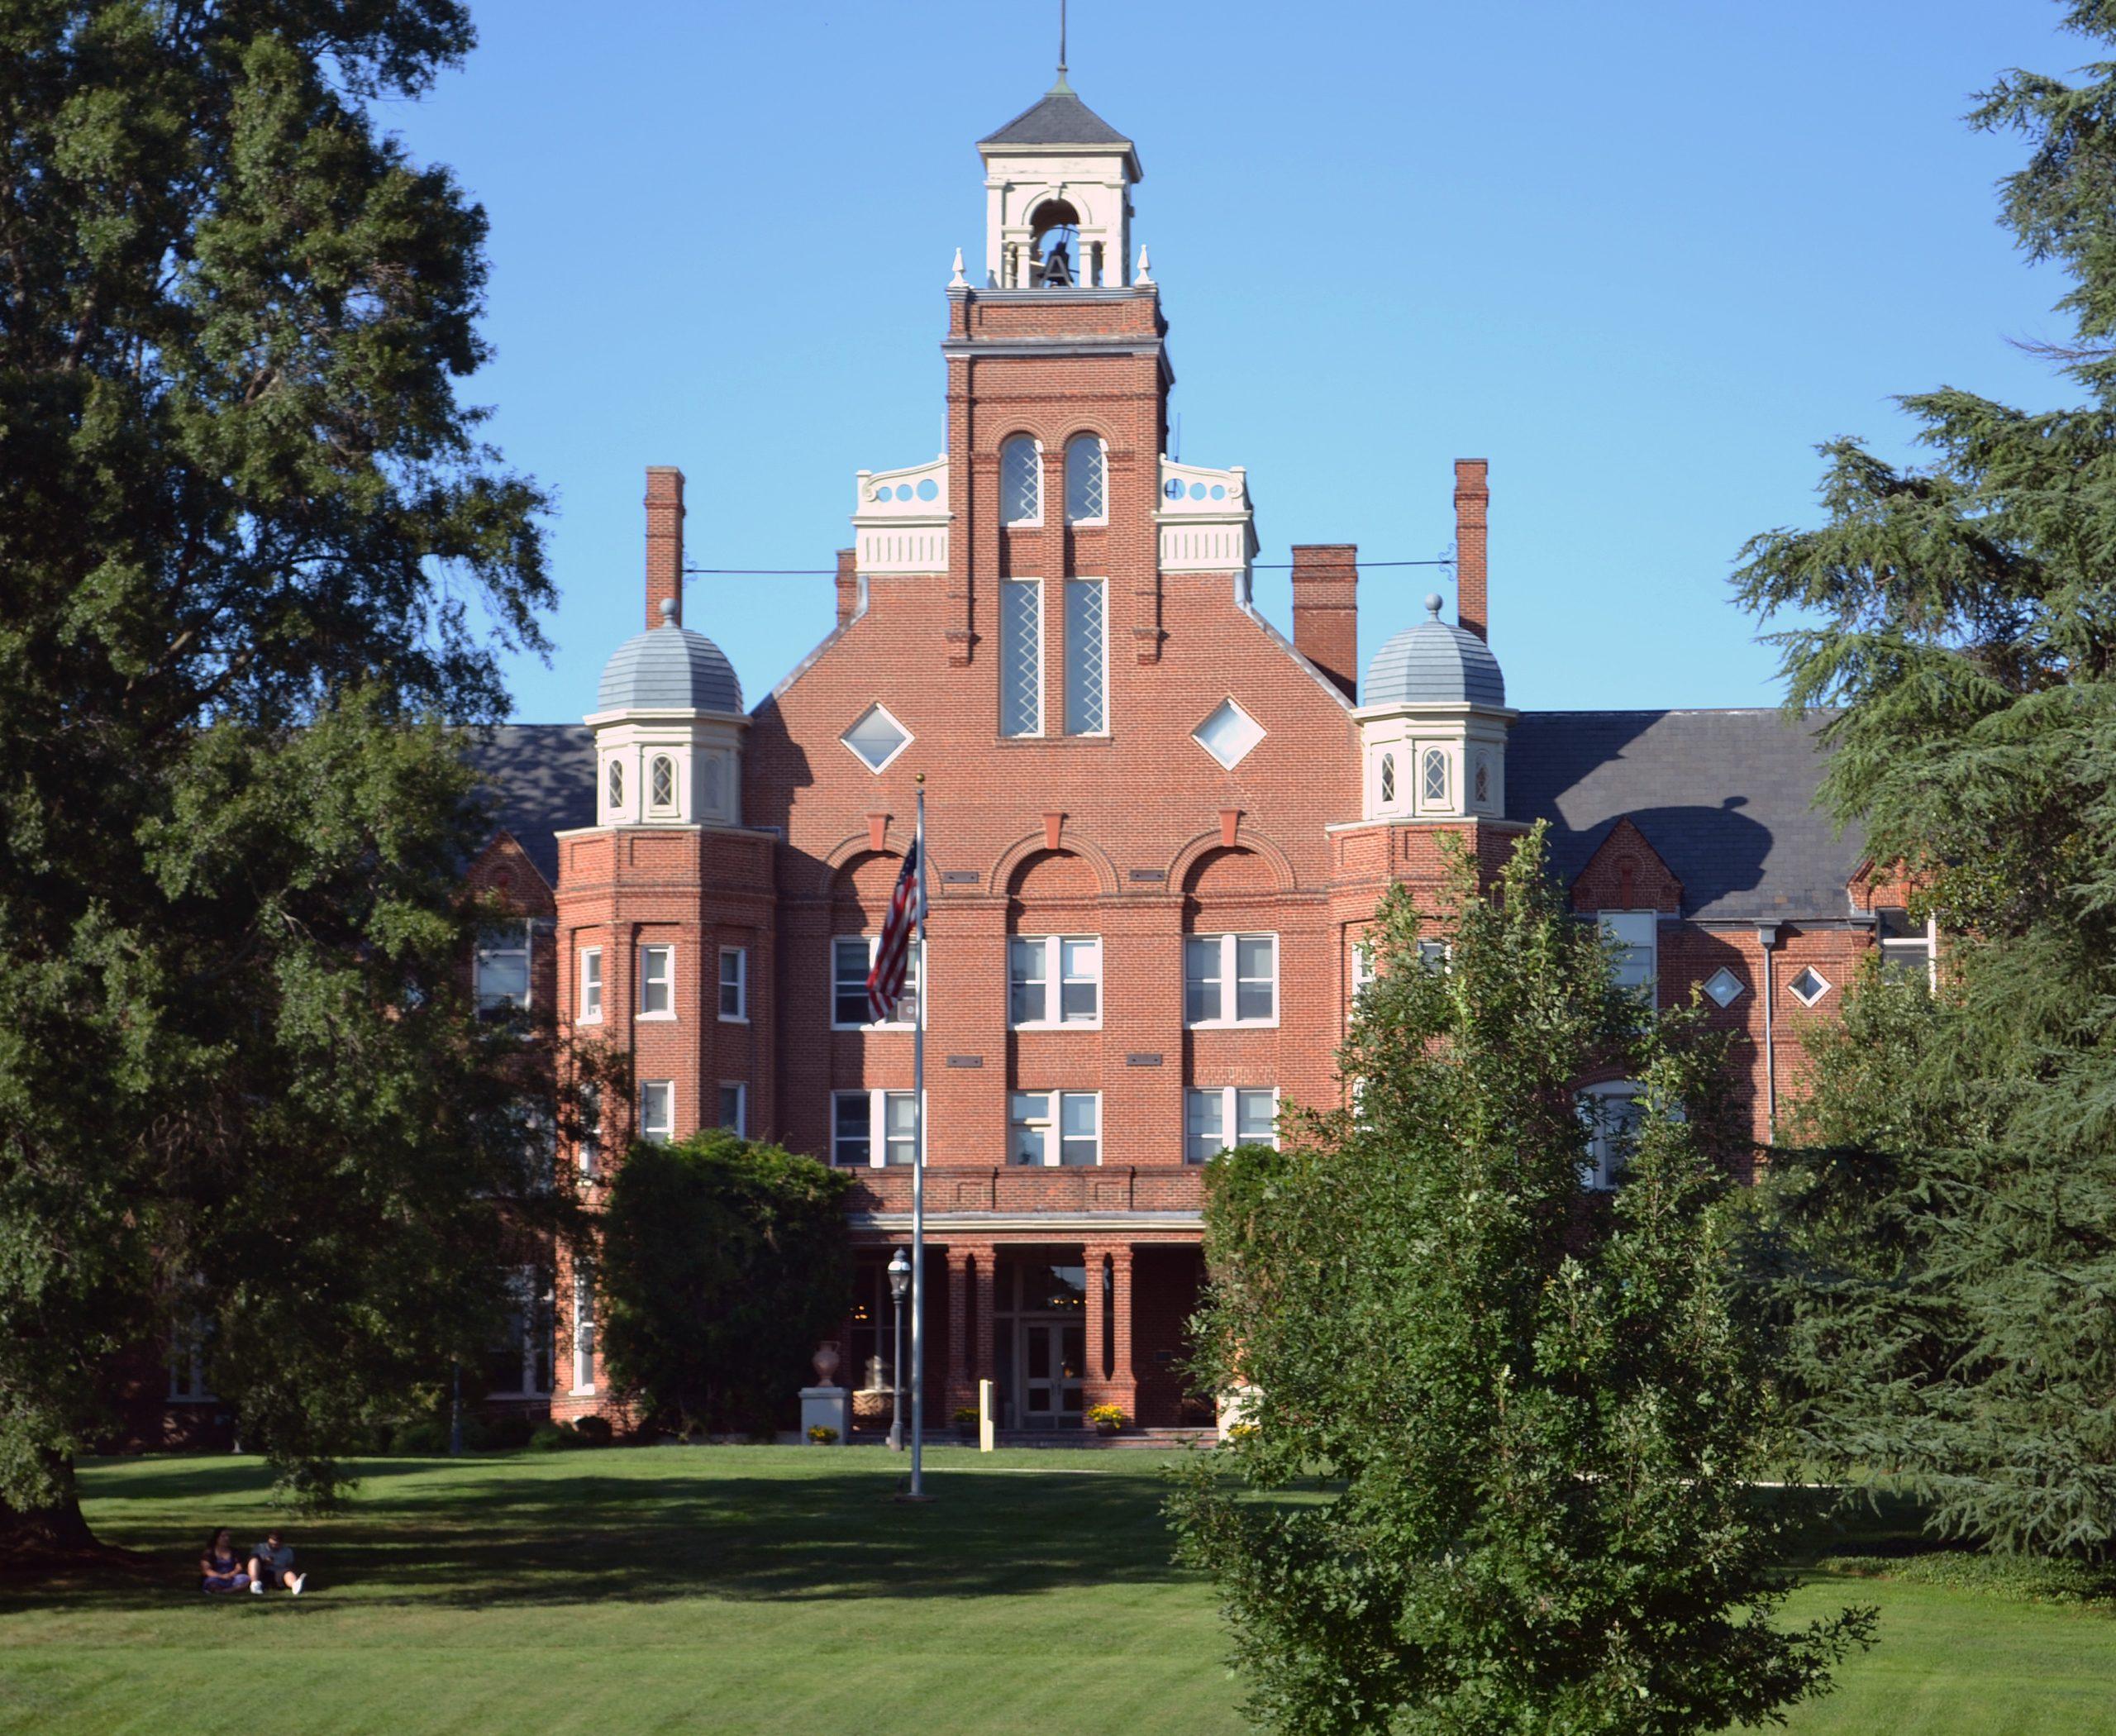 Randolph-Macon Woman's College Main Hall